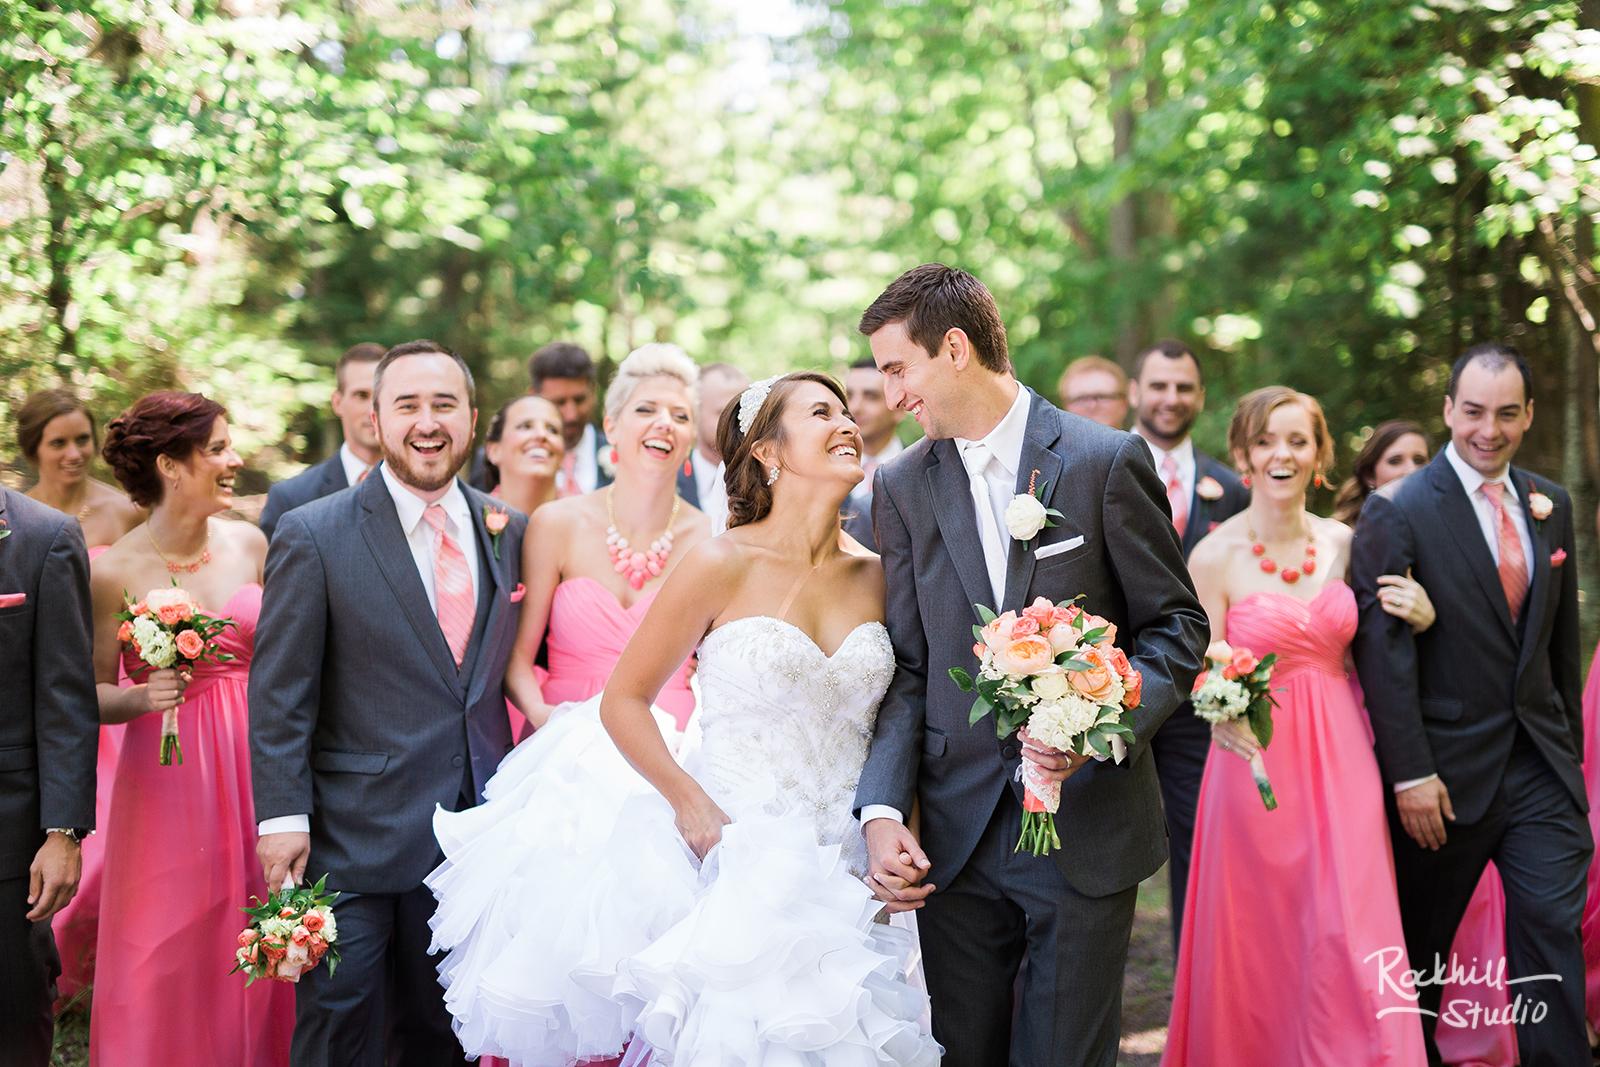 marquette-wedding-upper-peninsula-northern-michigan-wedding-ck-photography-wedding-party-12.jpg